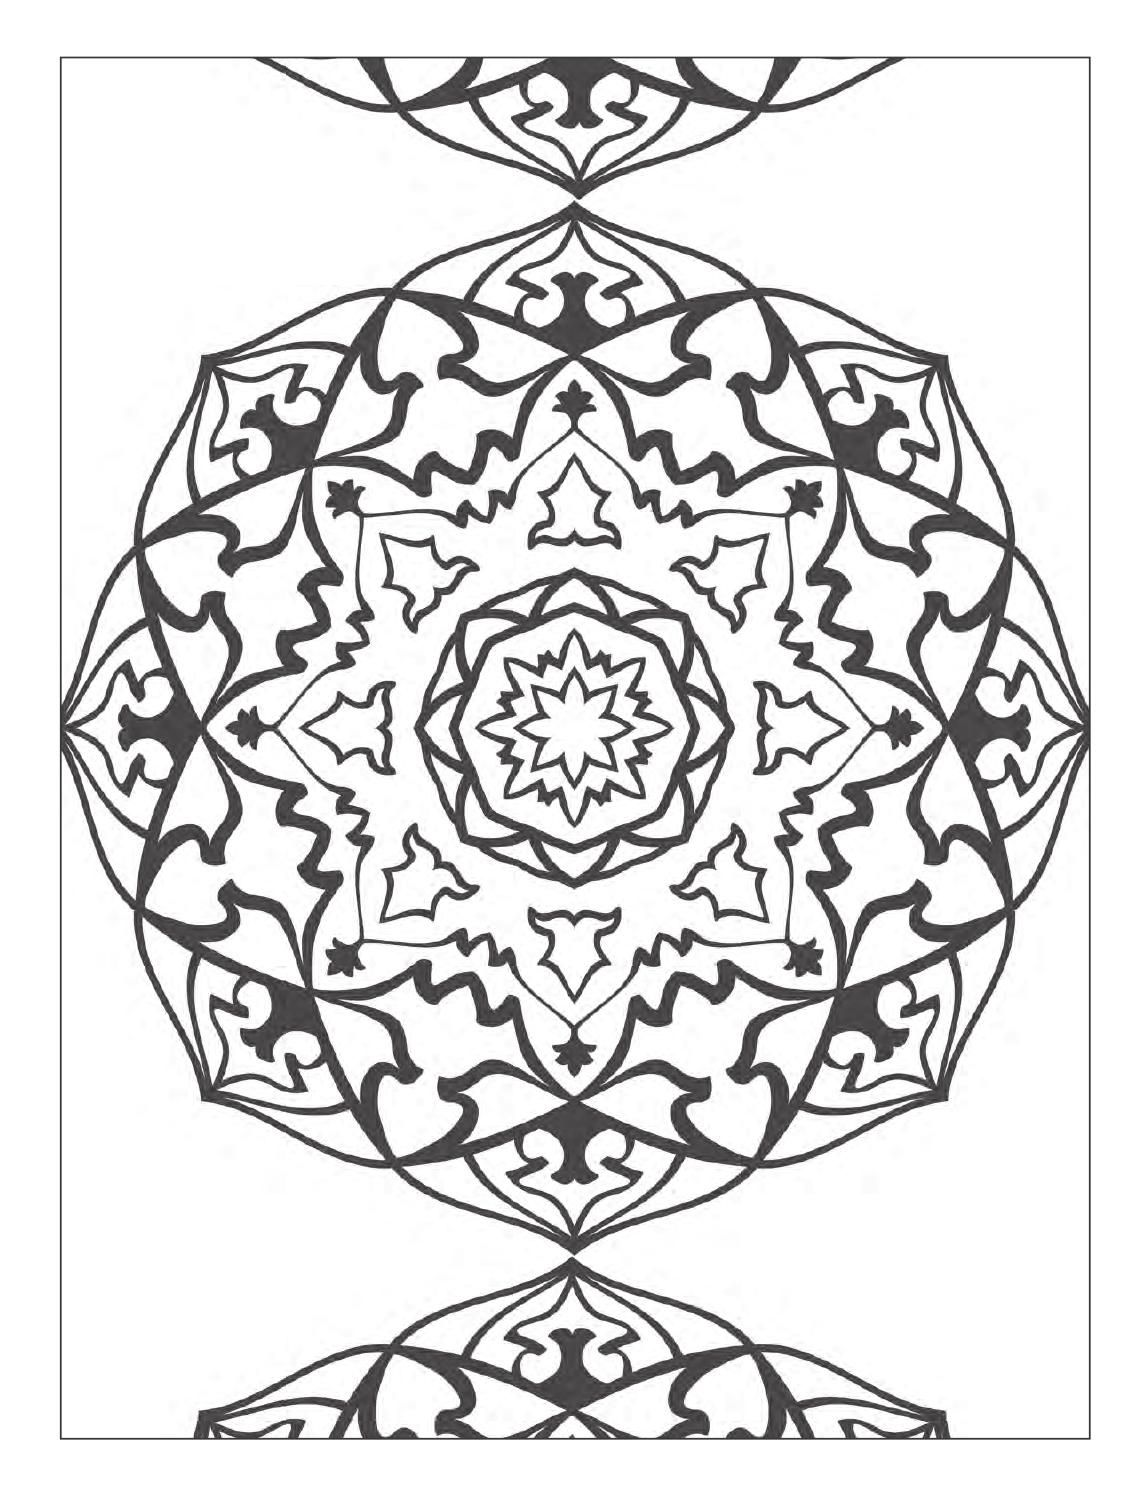 Coloring book adult meditation stress - Yoga And Meditation Coloring Book For Adults With Yoga Poses And Mandalas